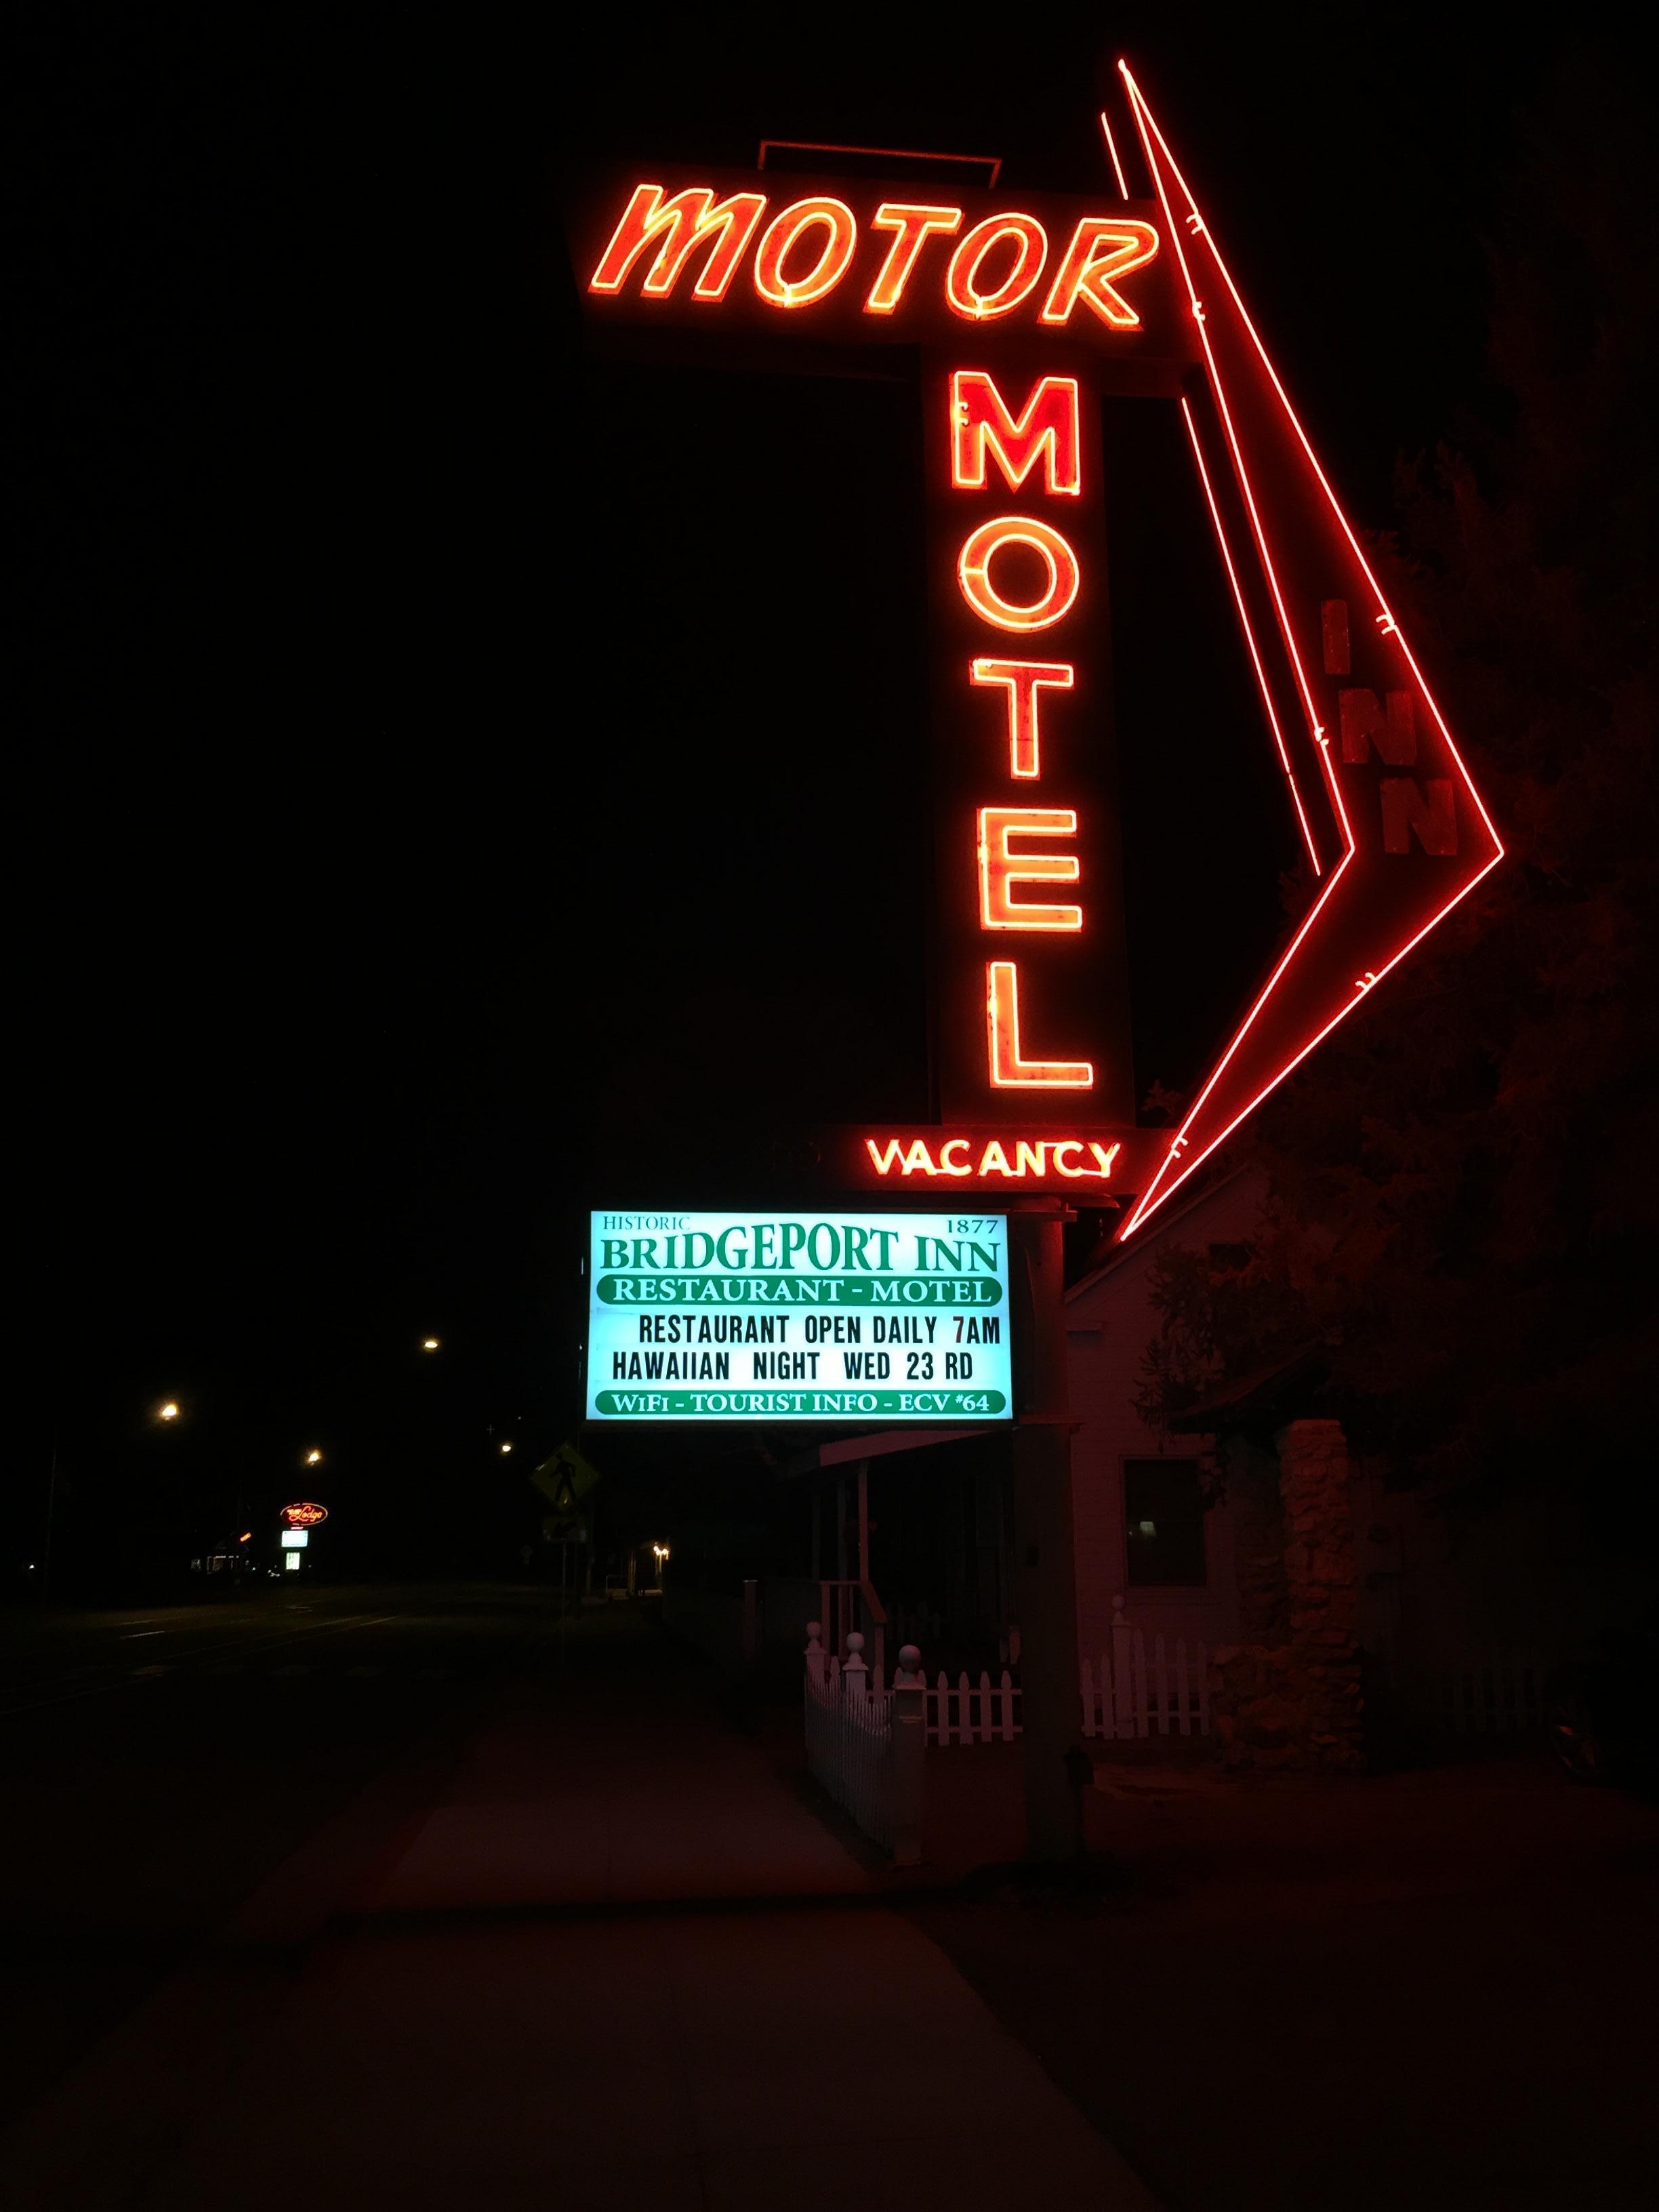 The sign is even nostalgic- but original